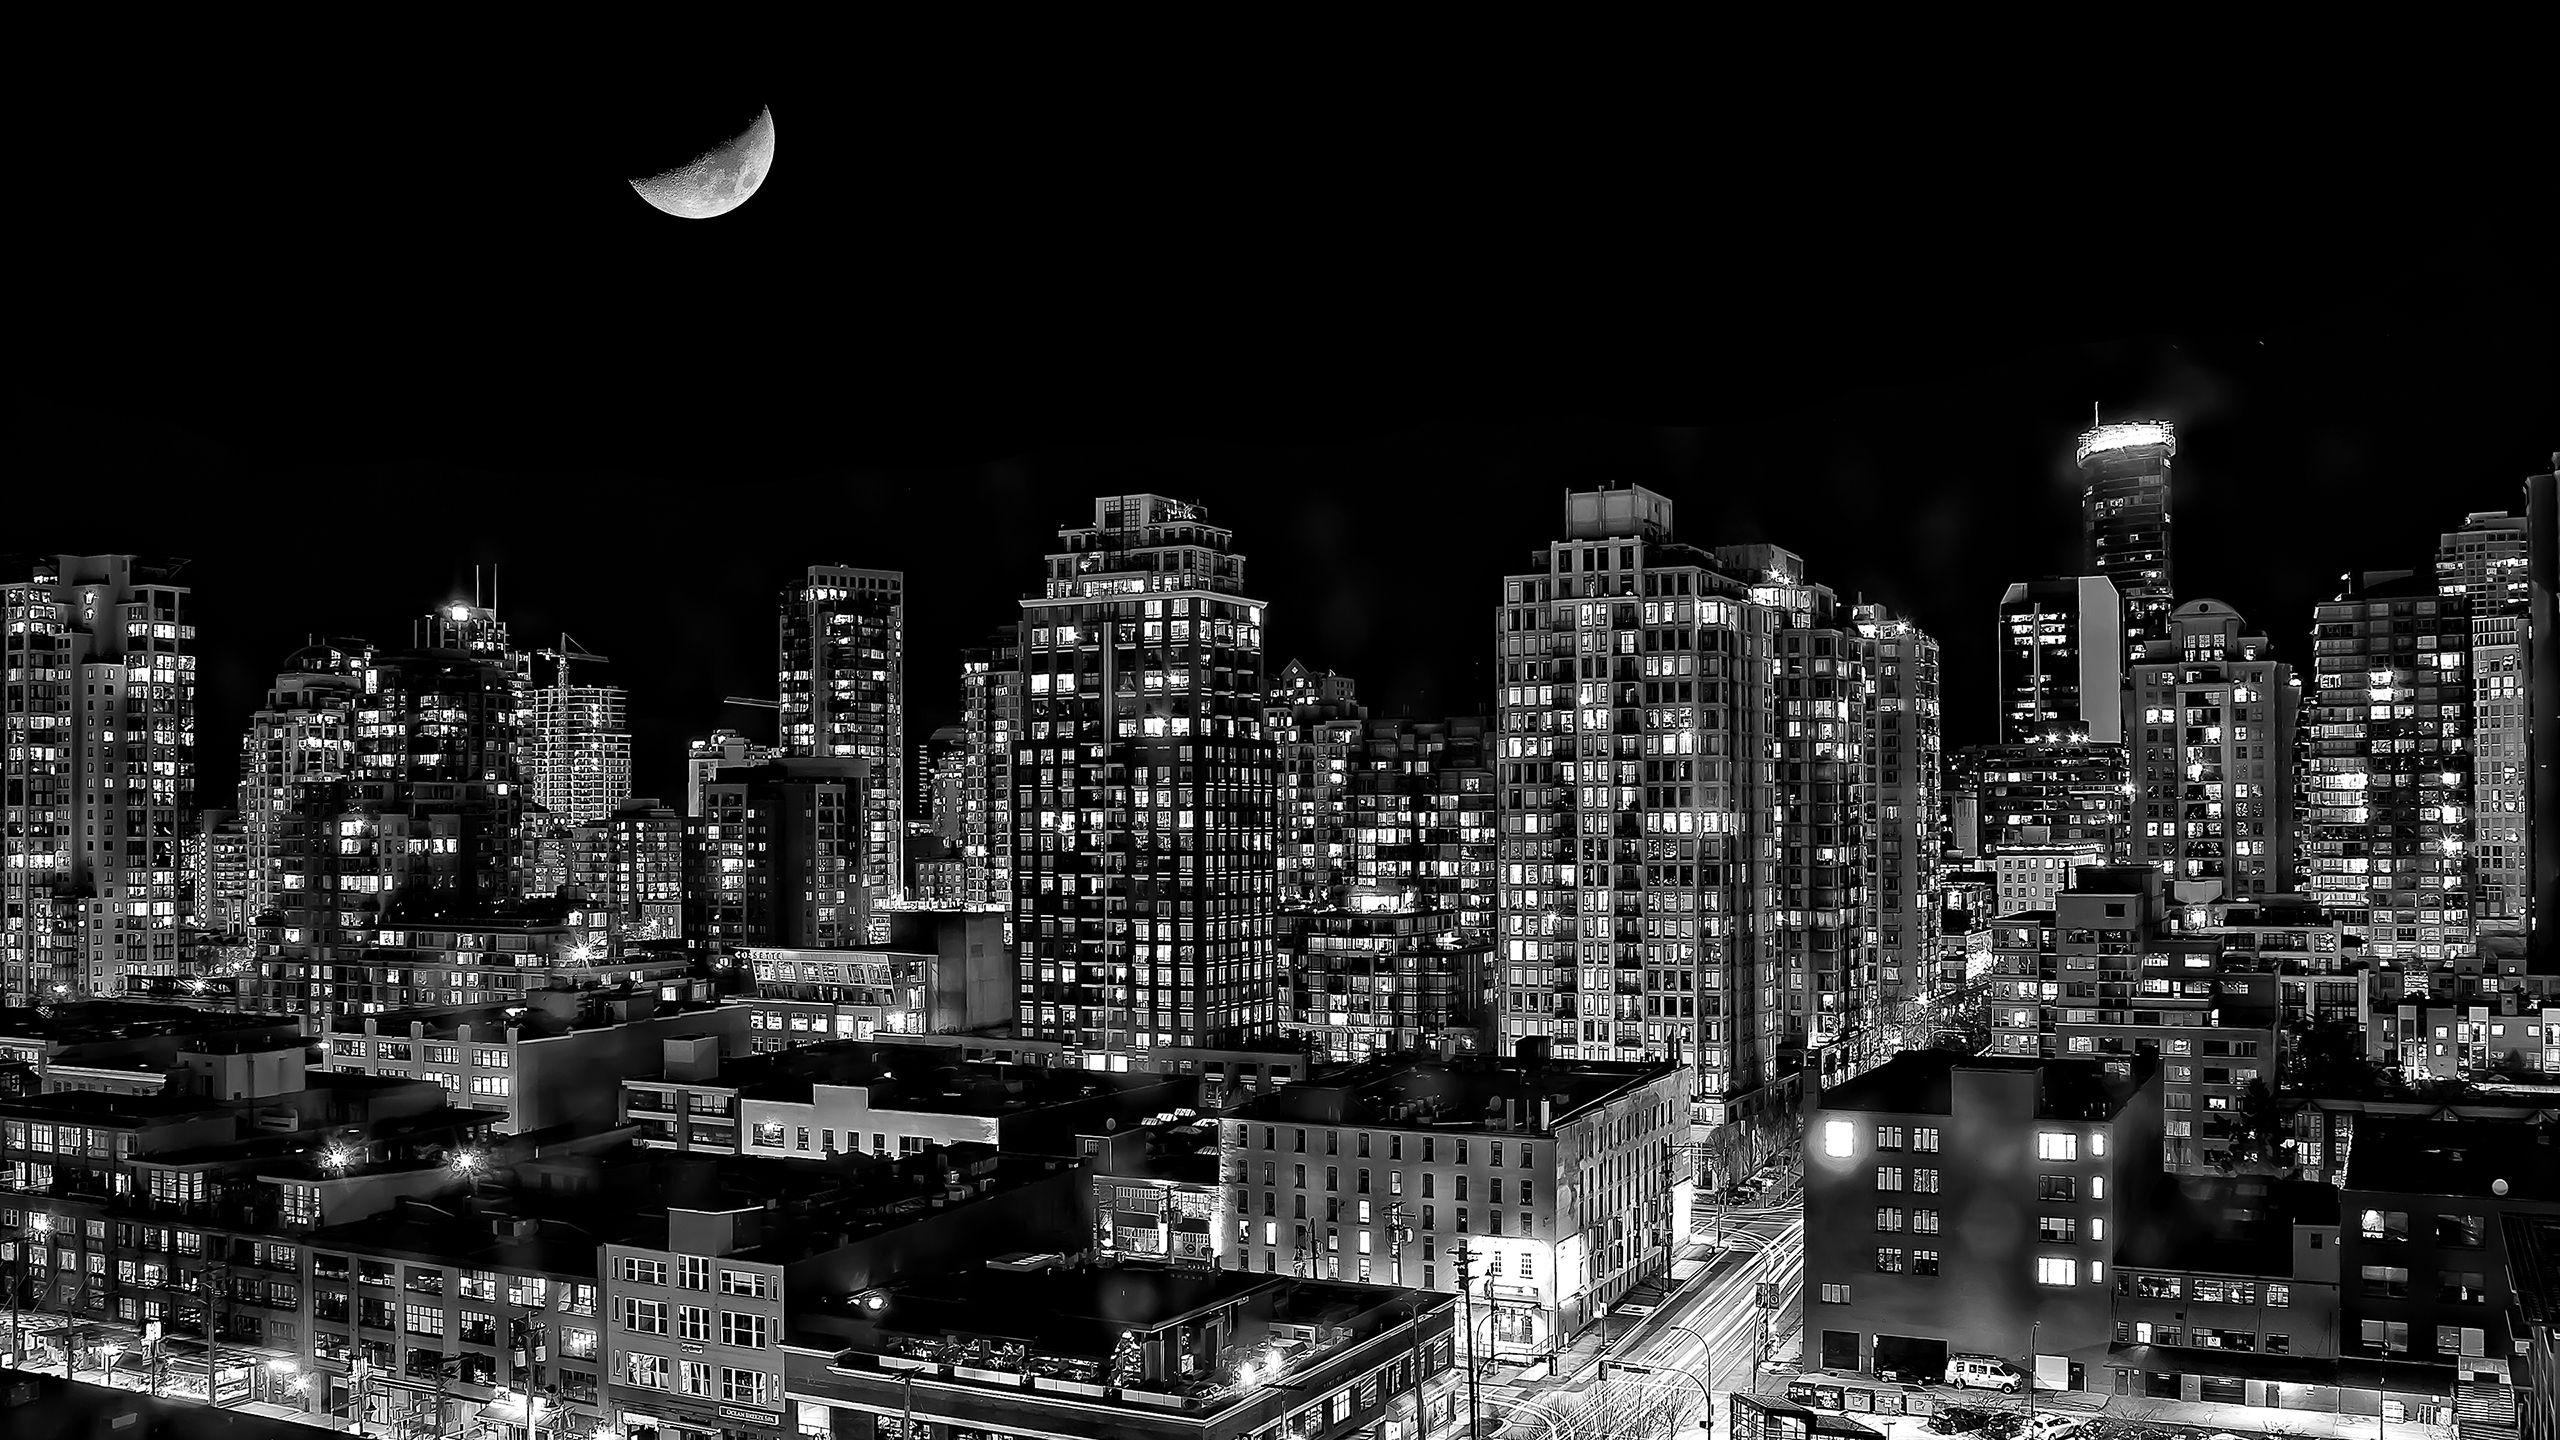 City Background 2 Black And White Landscape City Wallpaper Vancouver Wallpaper